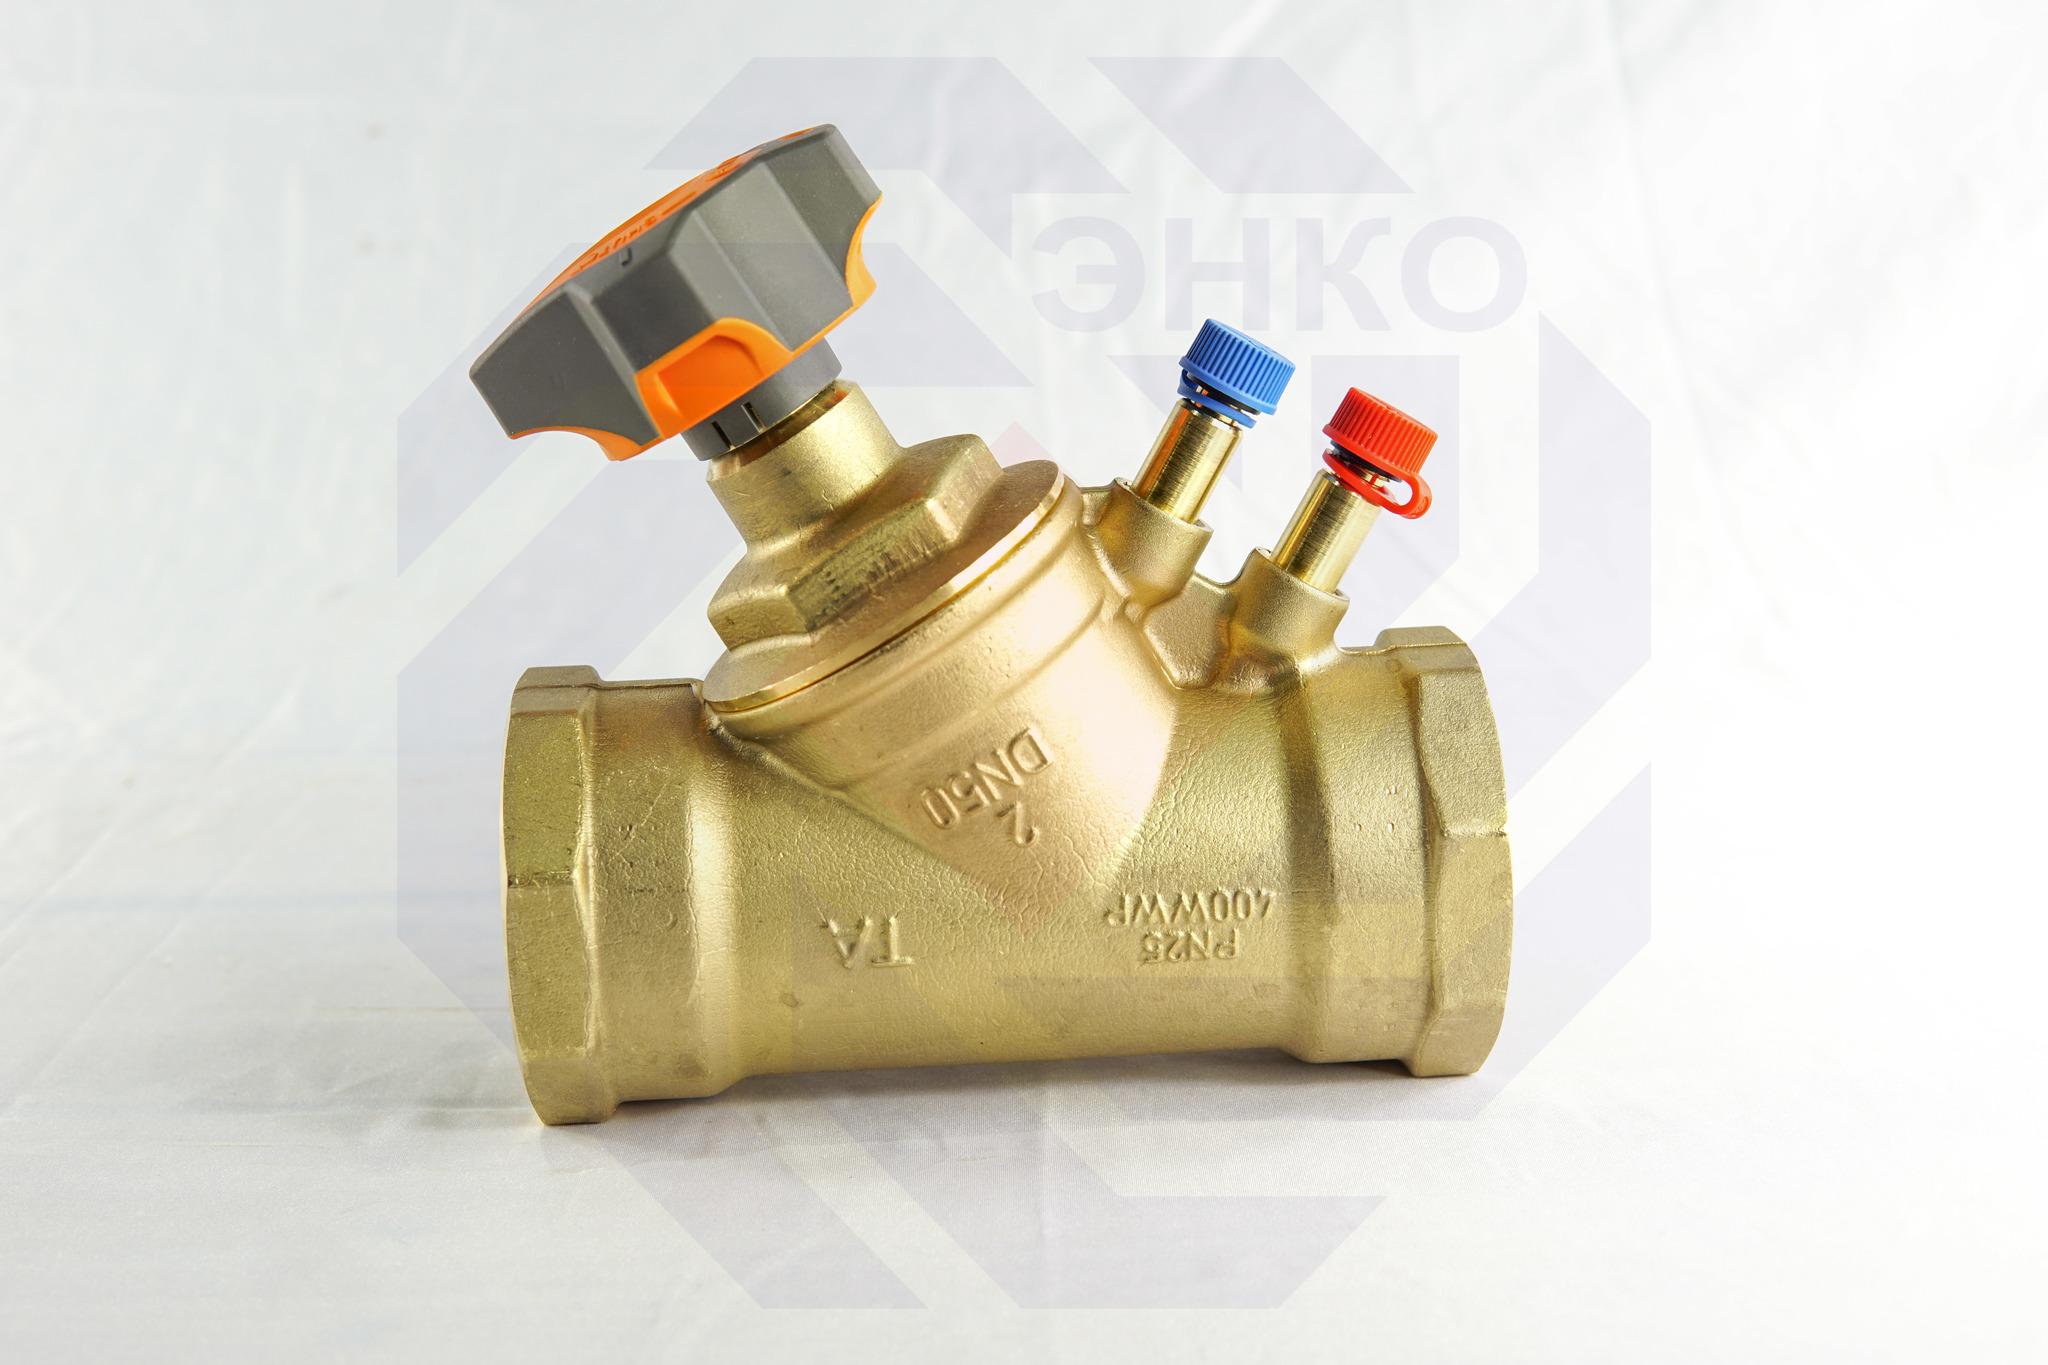 Клапан балансировочный IMI STAD DN 50